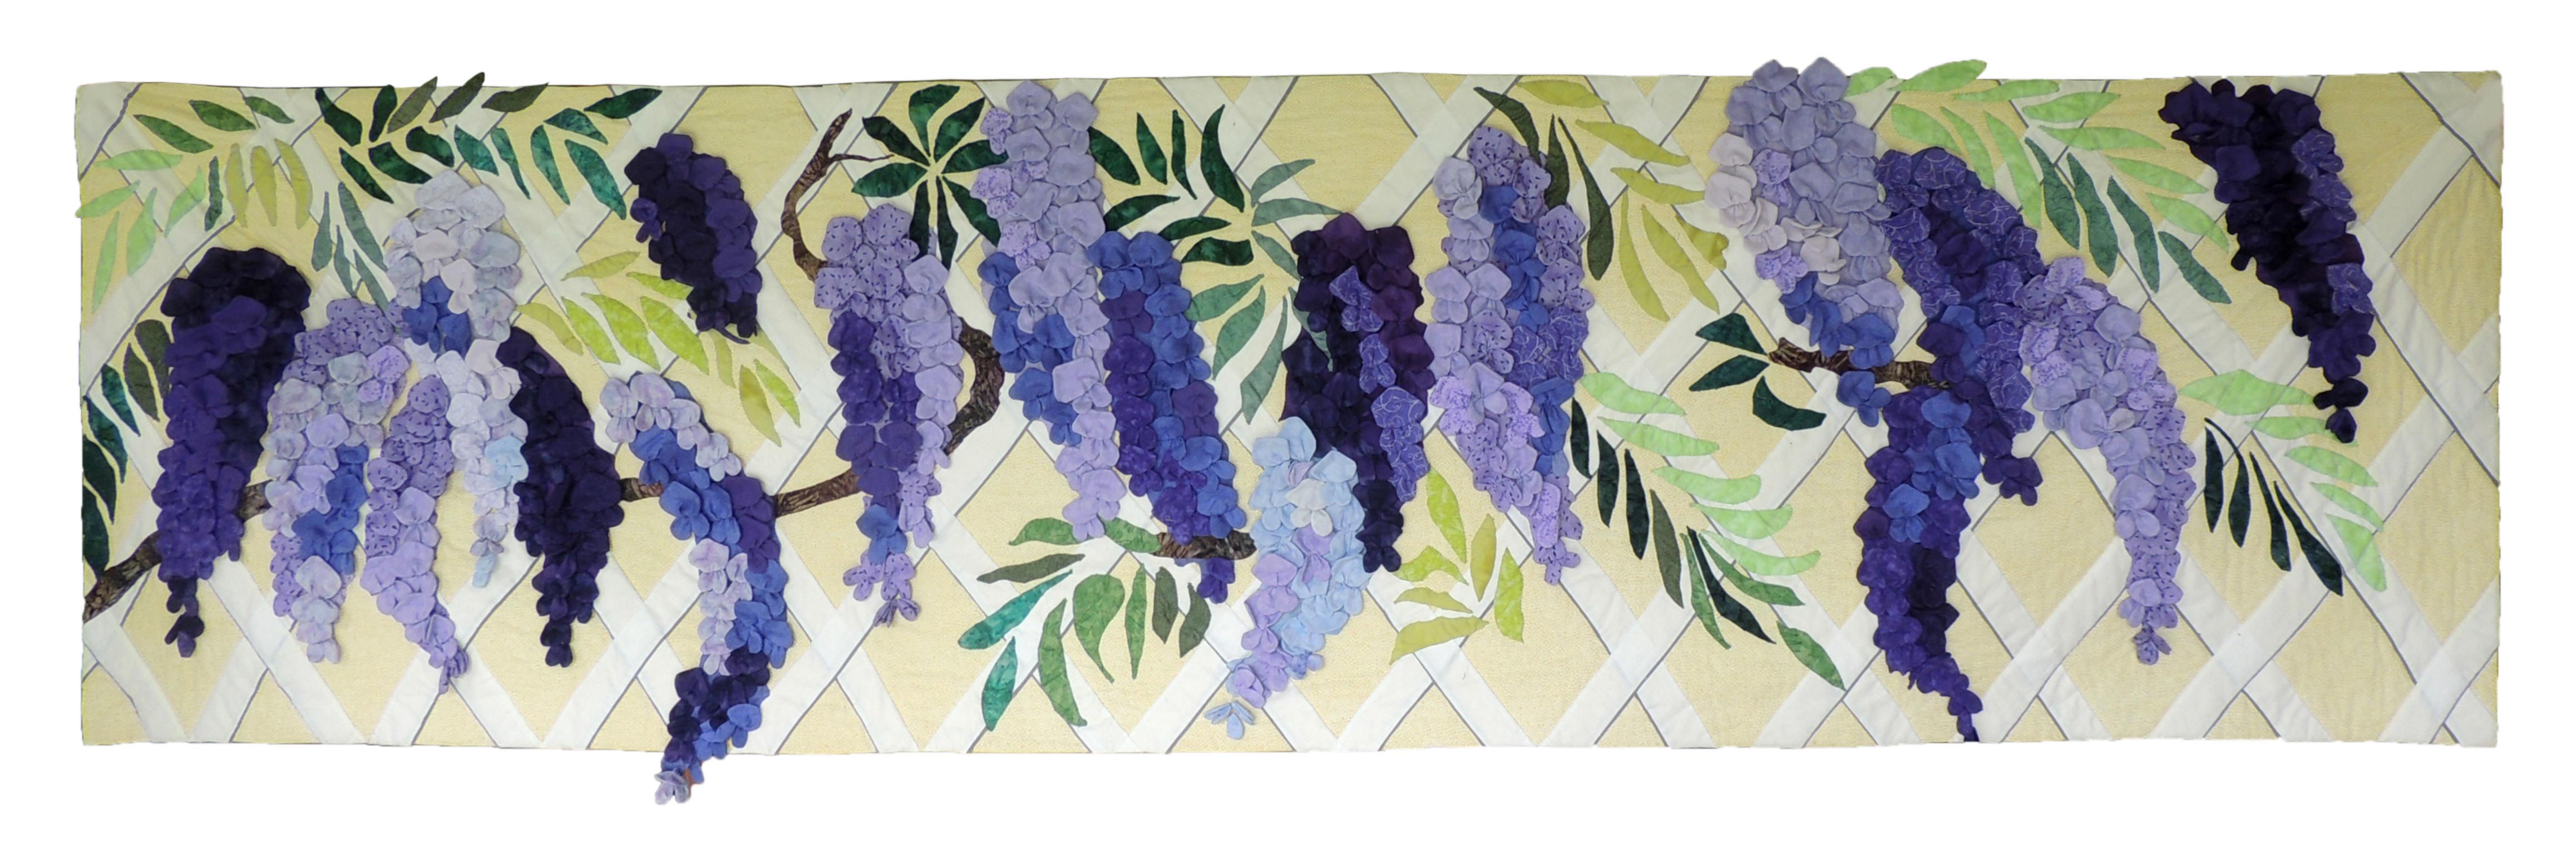 "Marianne Rabb Britton | WISTERIA | Fabric & Embroidery | 31 x 106"" | Estate of Marianne Rabb Britton"